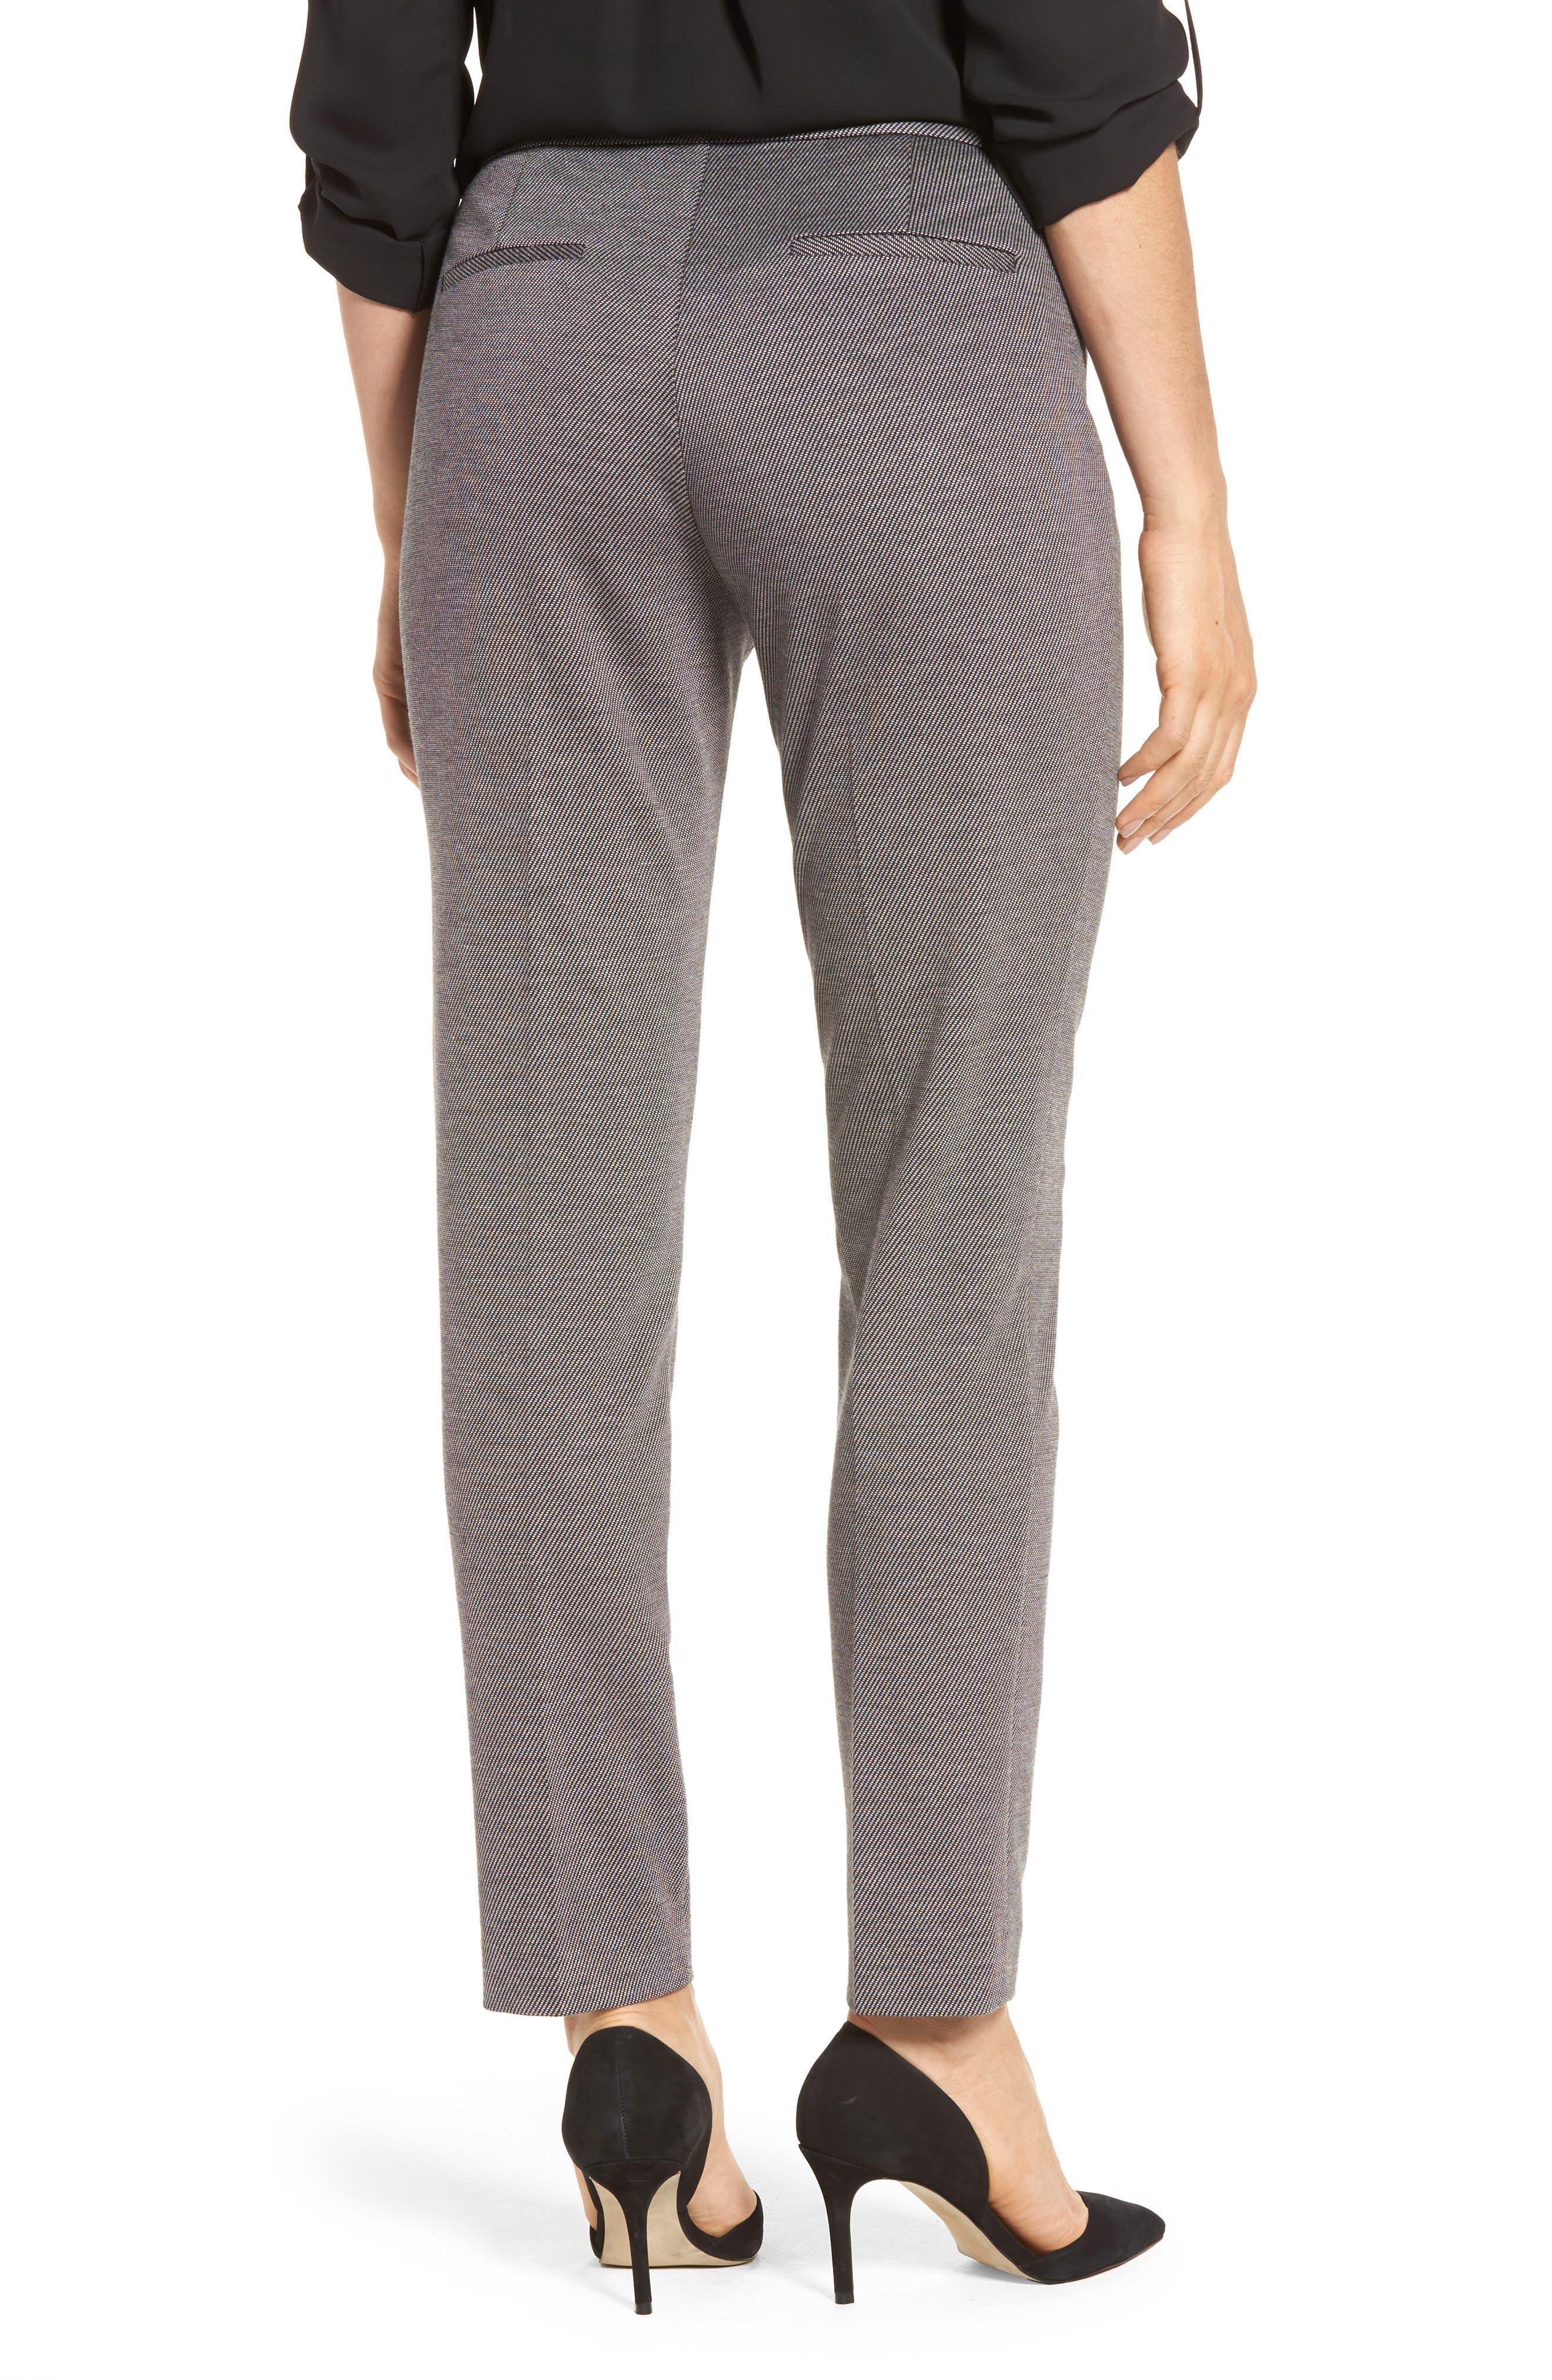 Slim Twill Ponte Knit Pants,                             Alternate thumbnail 2, color,                             020